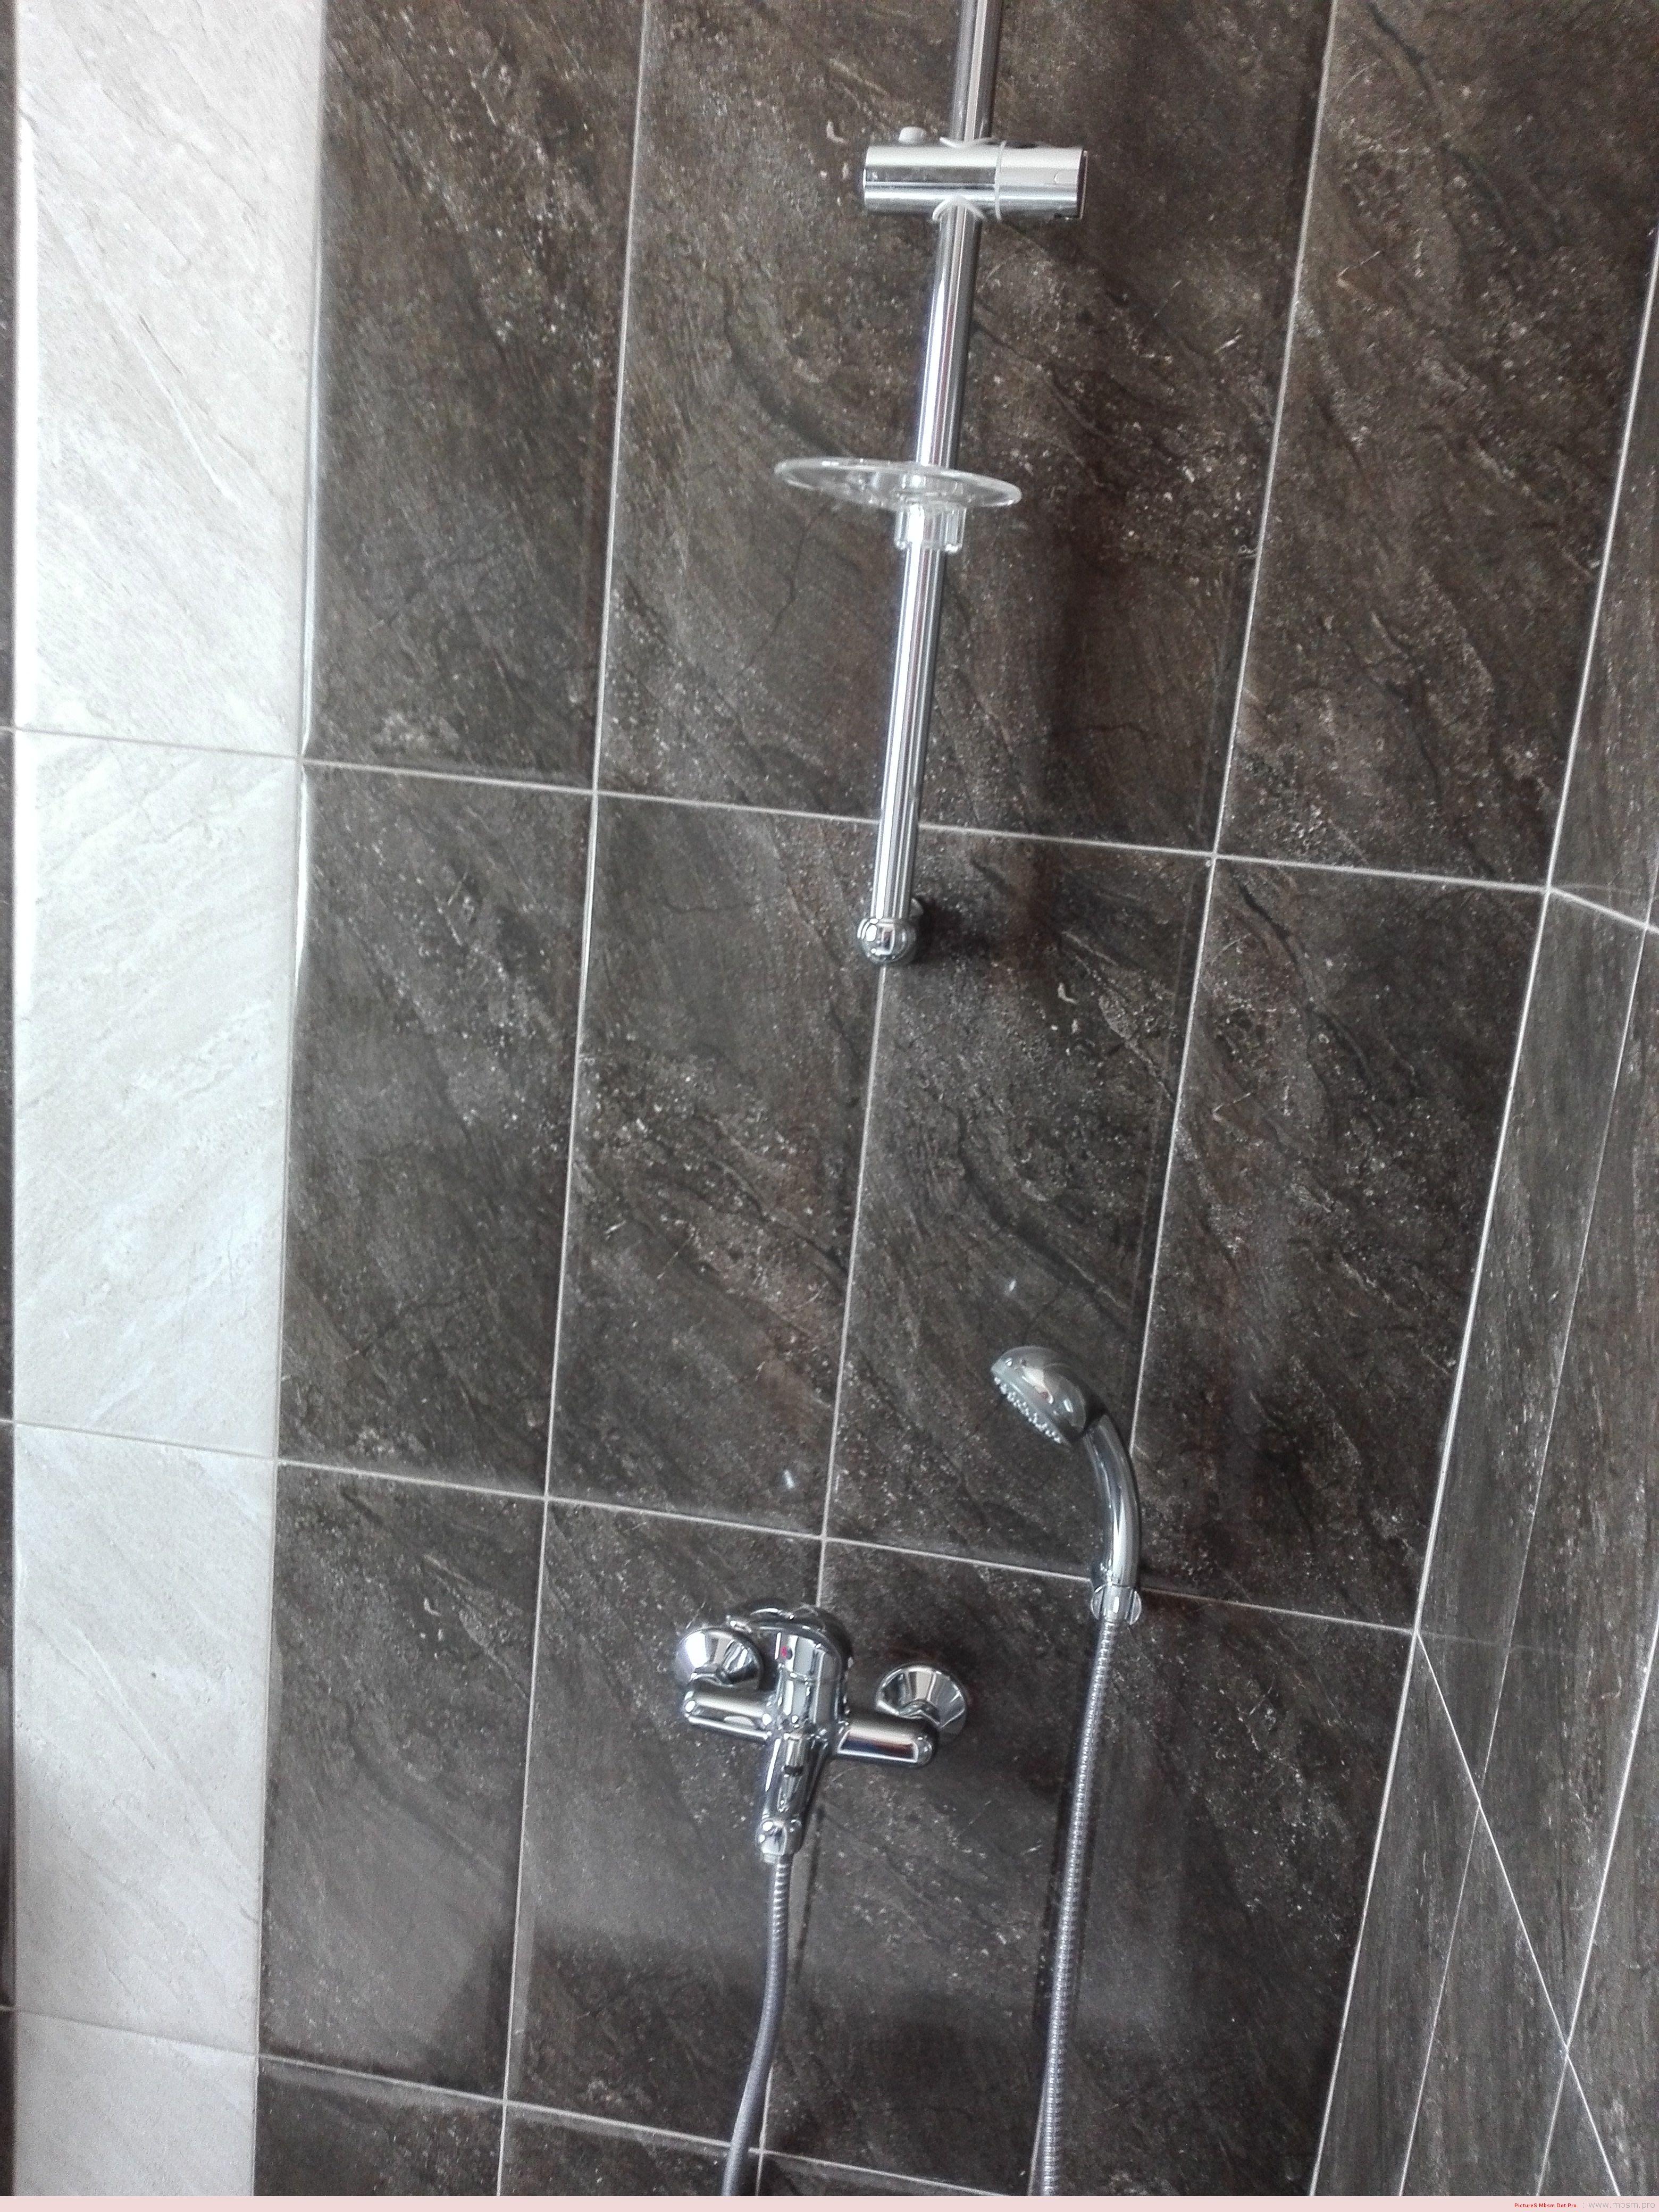 mbsm-dot-pro-wwwmbsmpro--plomberie--finition-douche--installation-multicouche-avec-collecteur